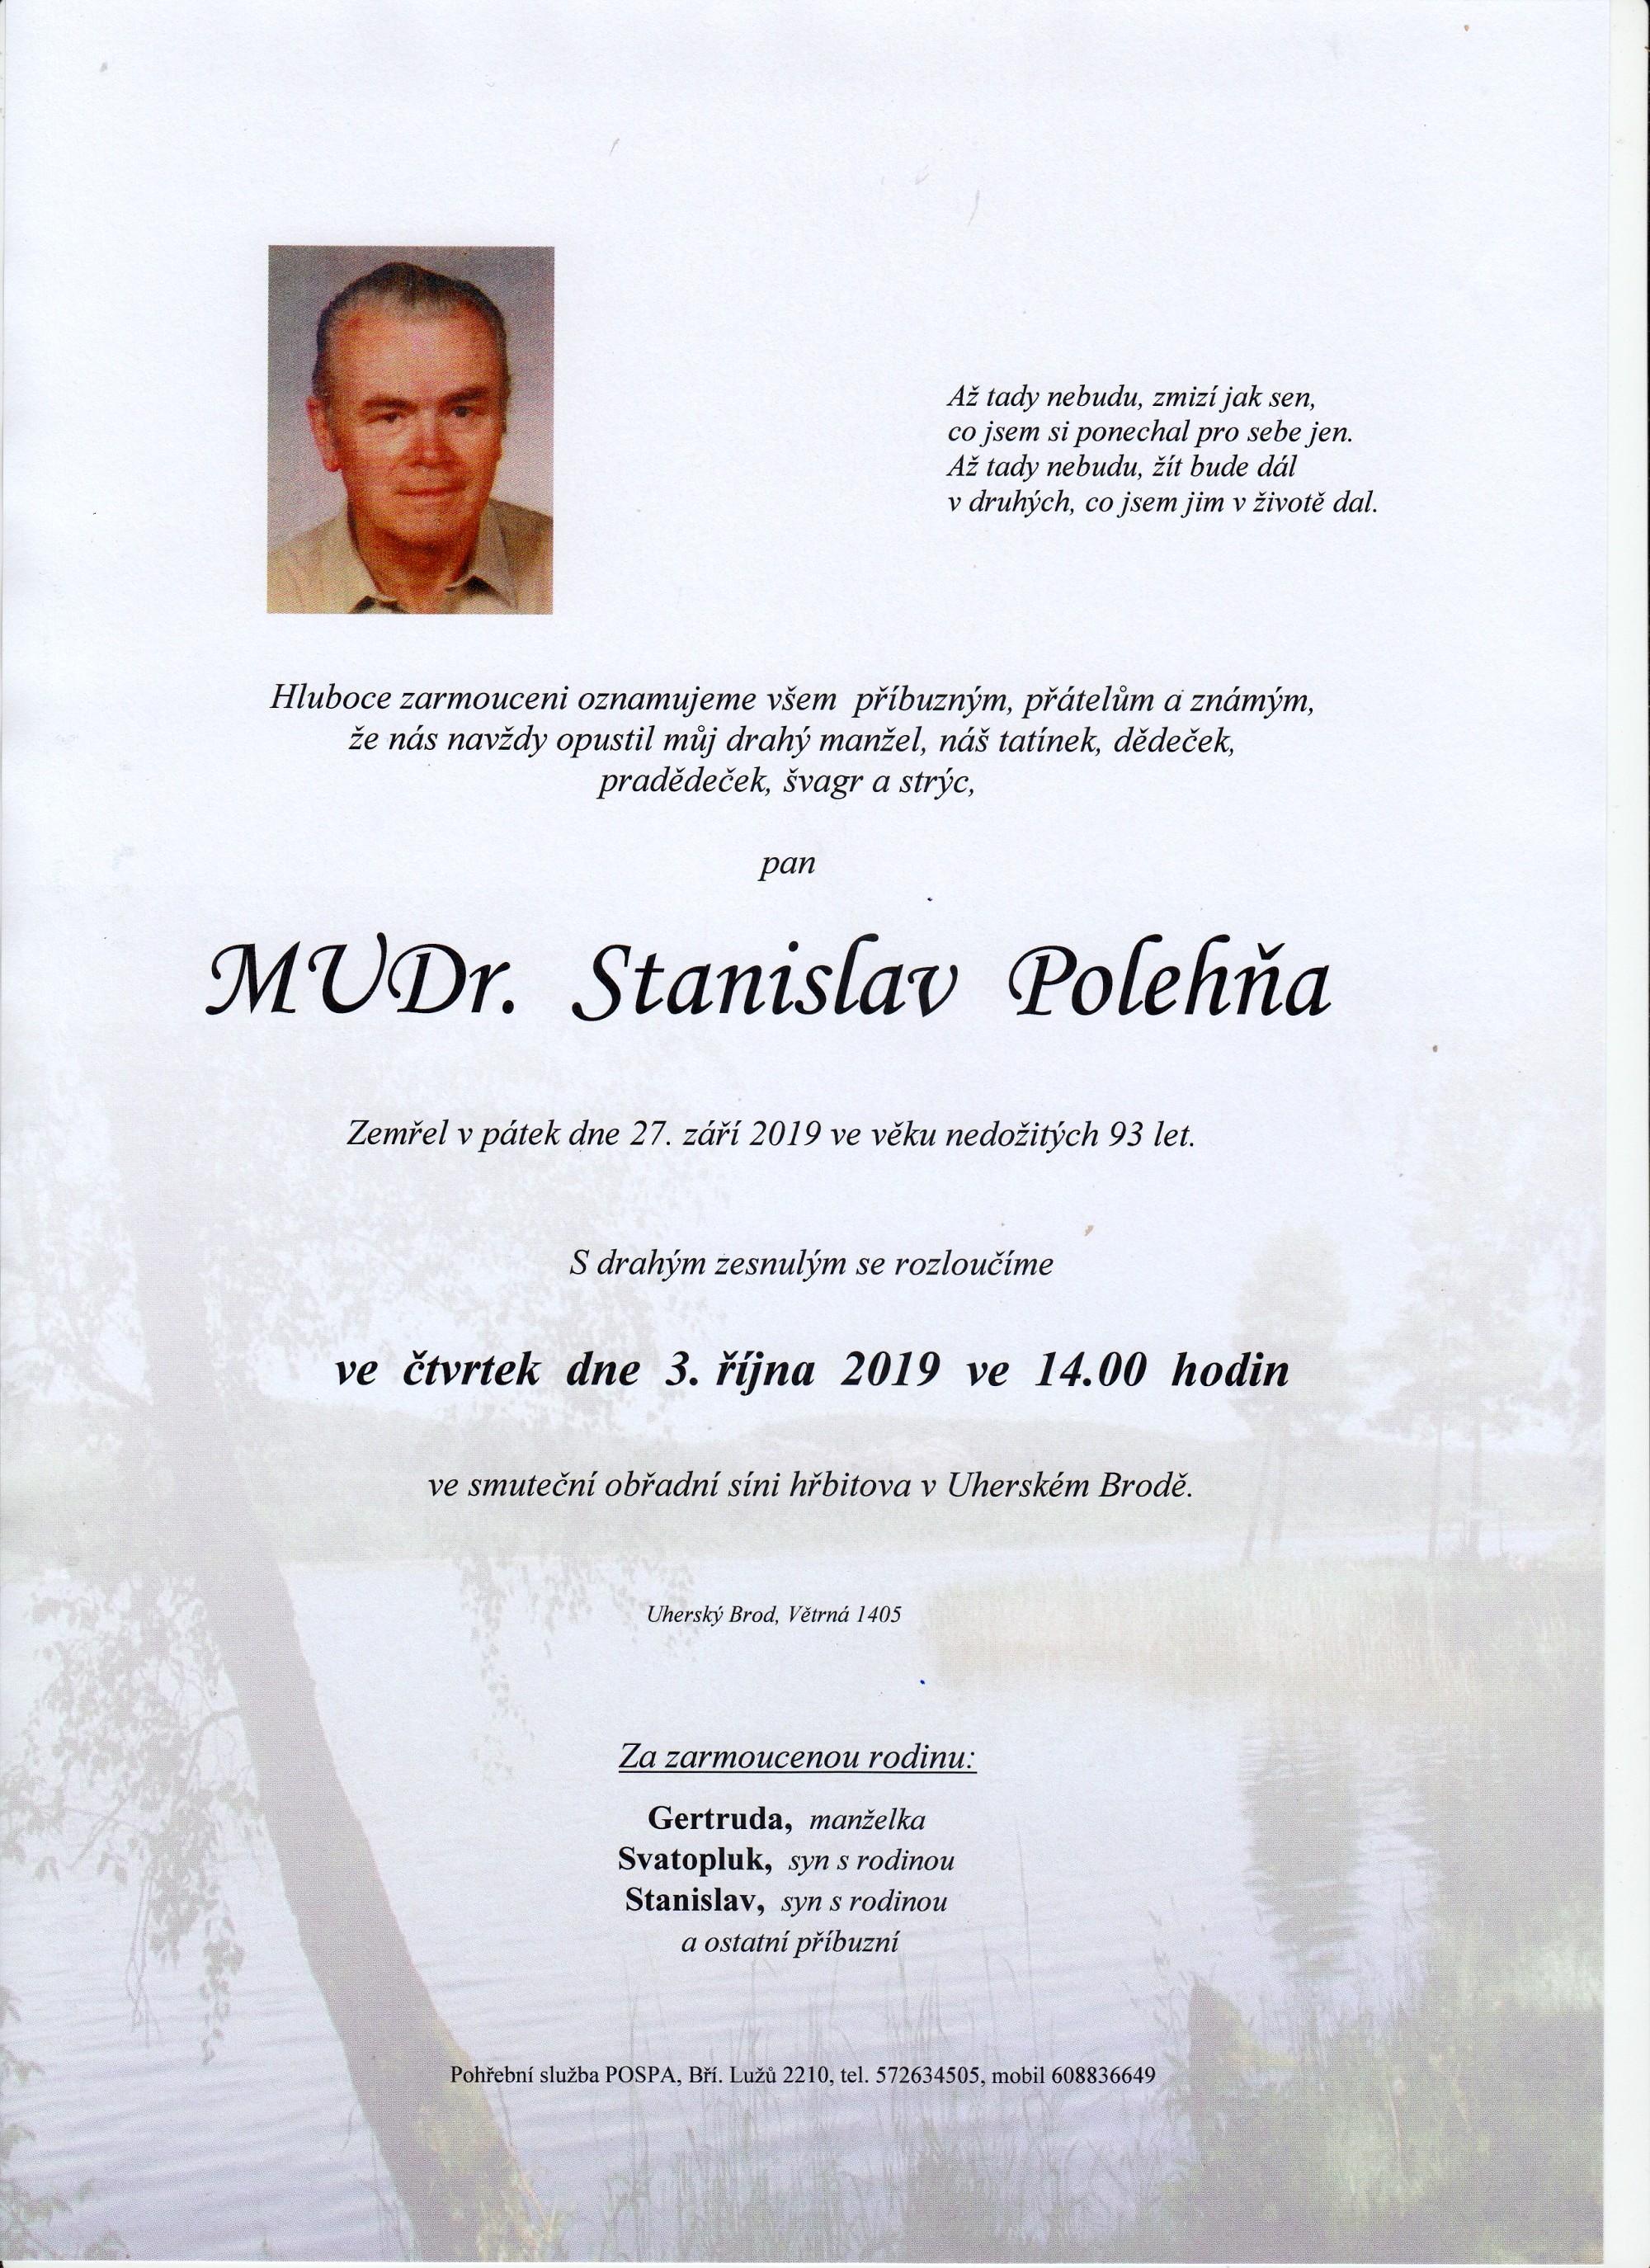 MUDr. Stanislav Polehňa